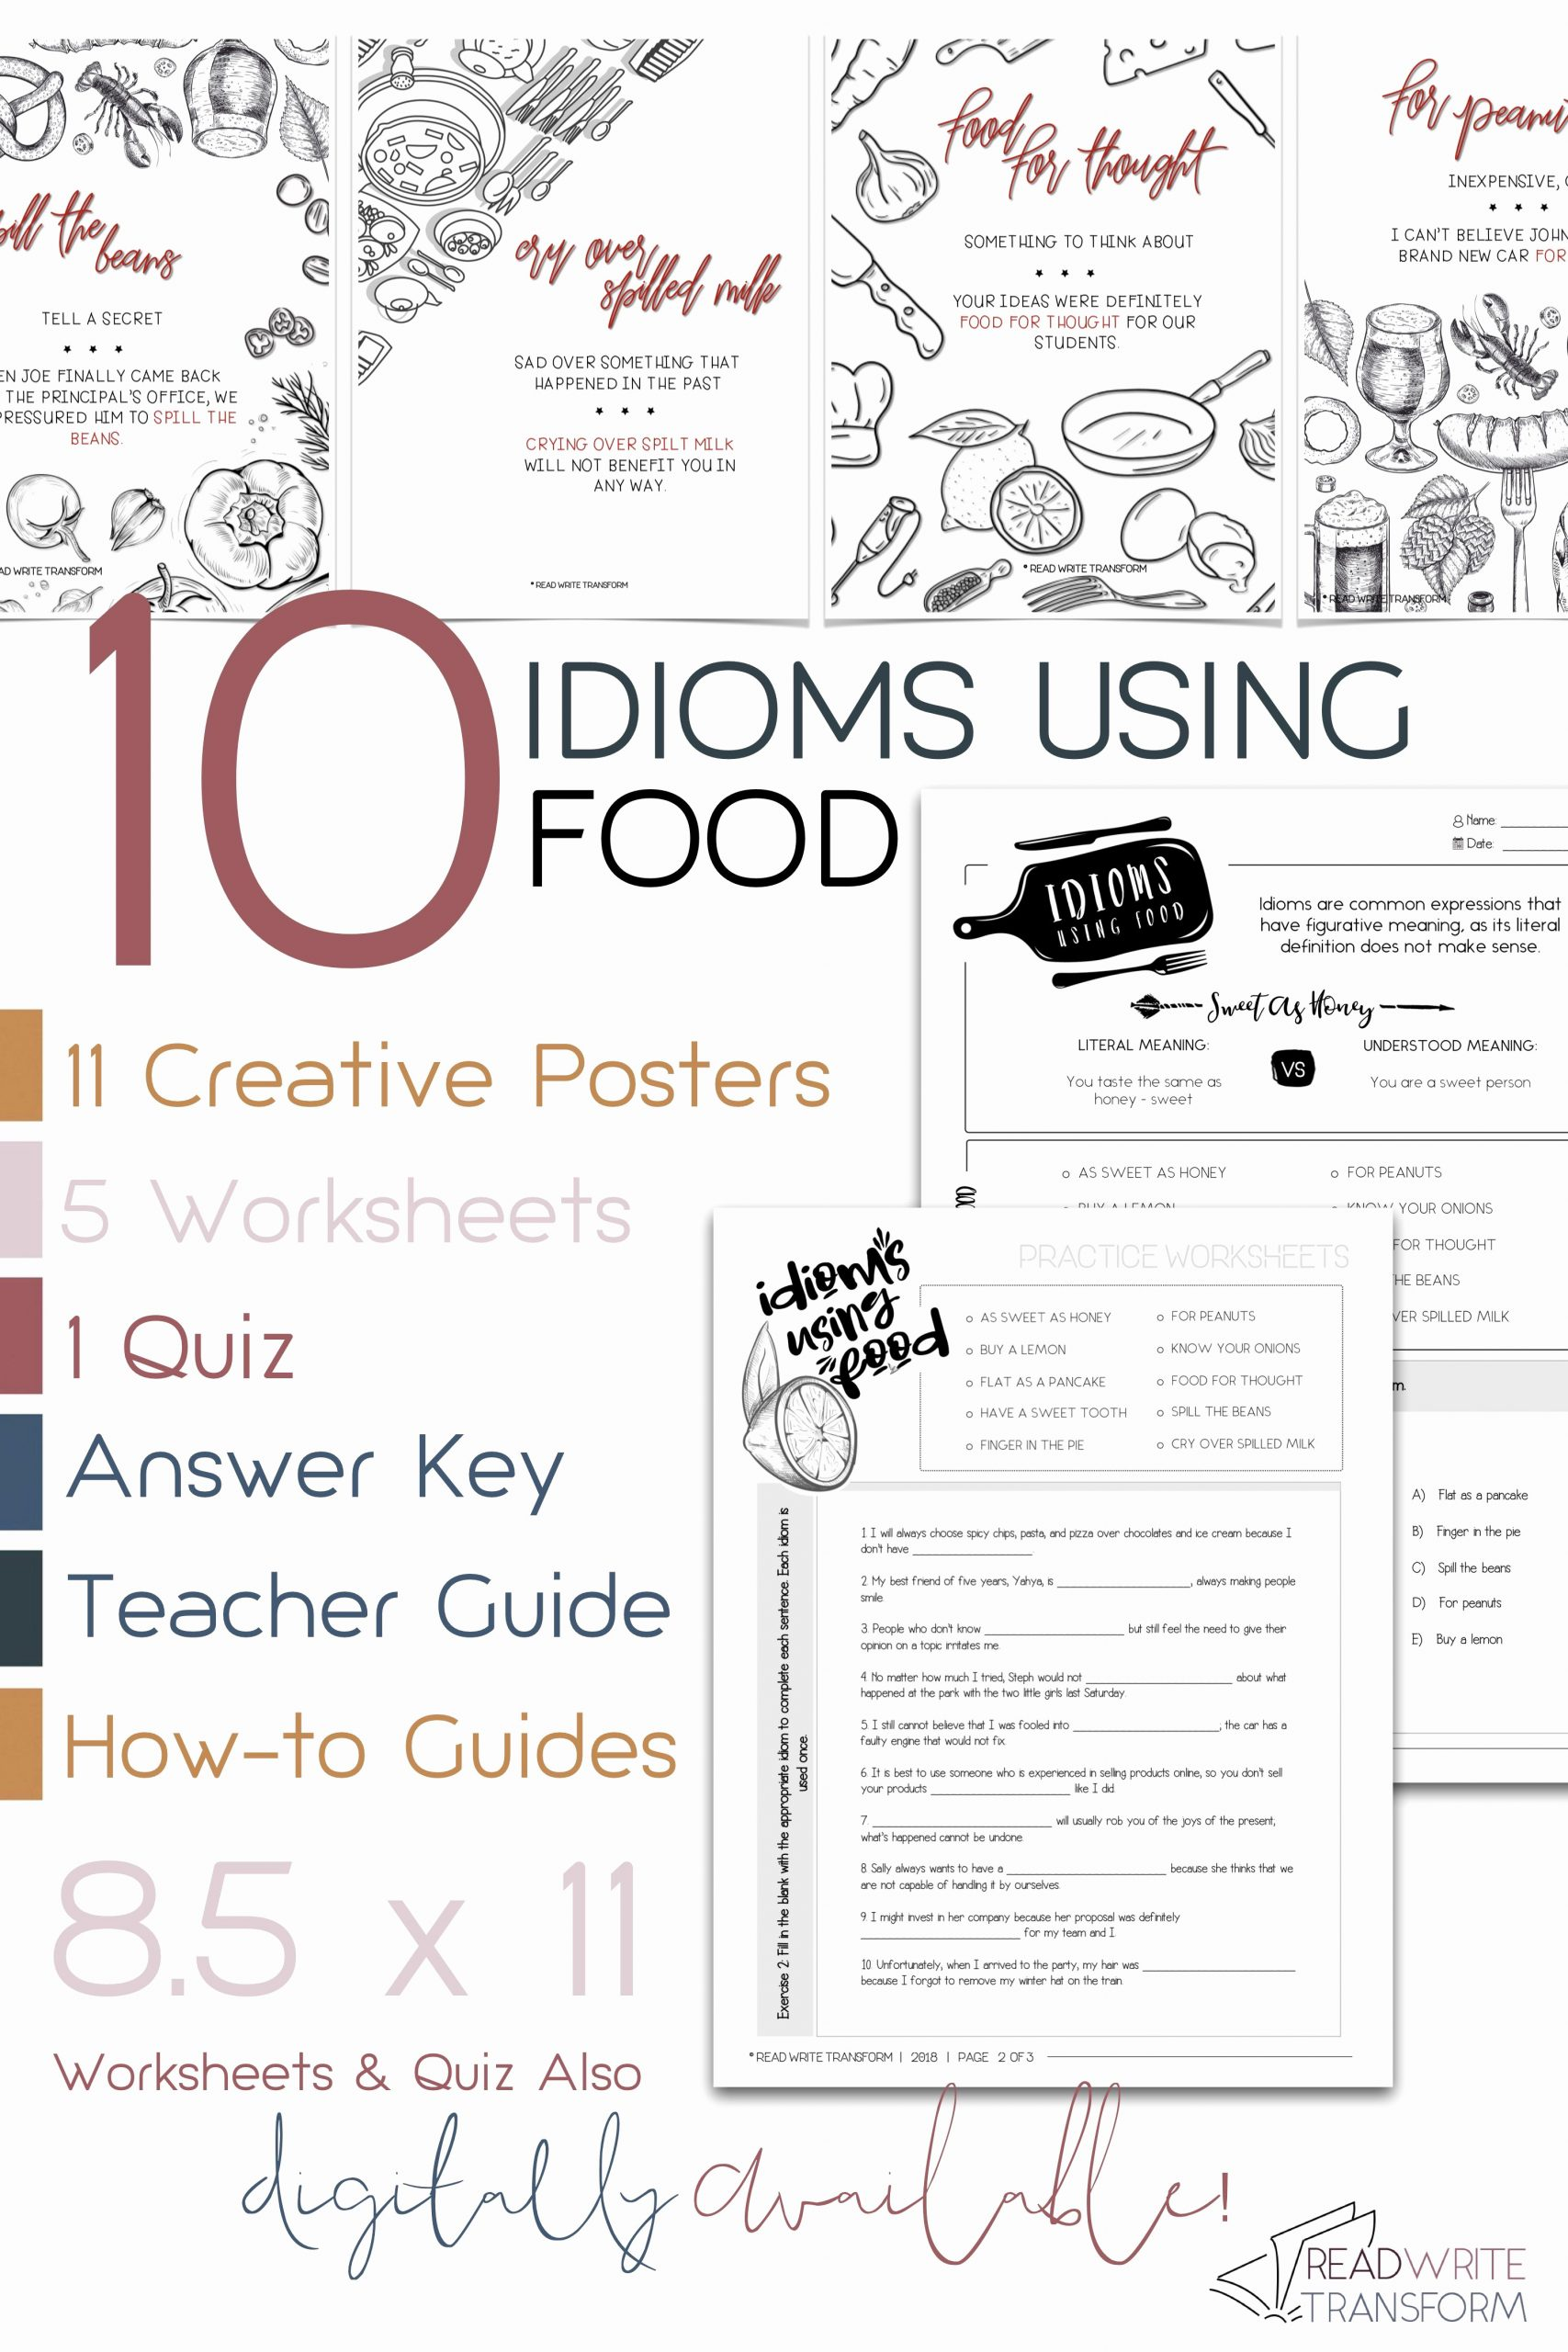 Cooking Worksheets for Middle School Elegant 10 Idioms Using Food Posters Worksheets Quiz Digital